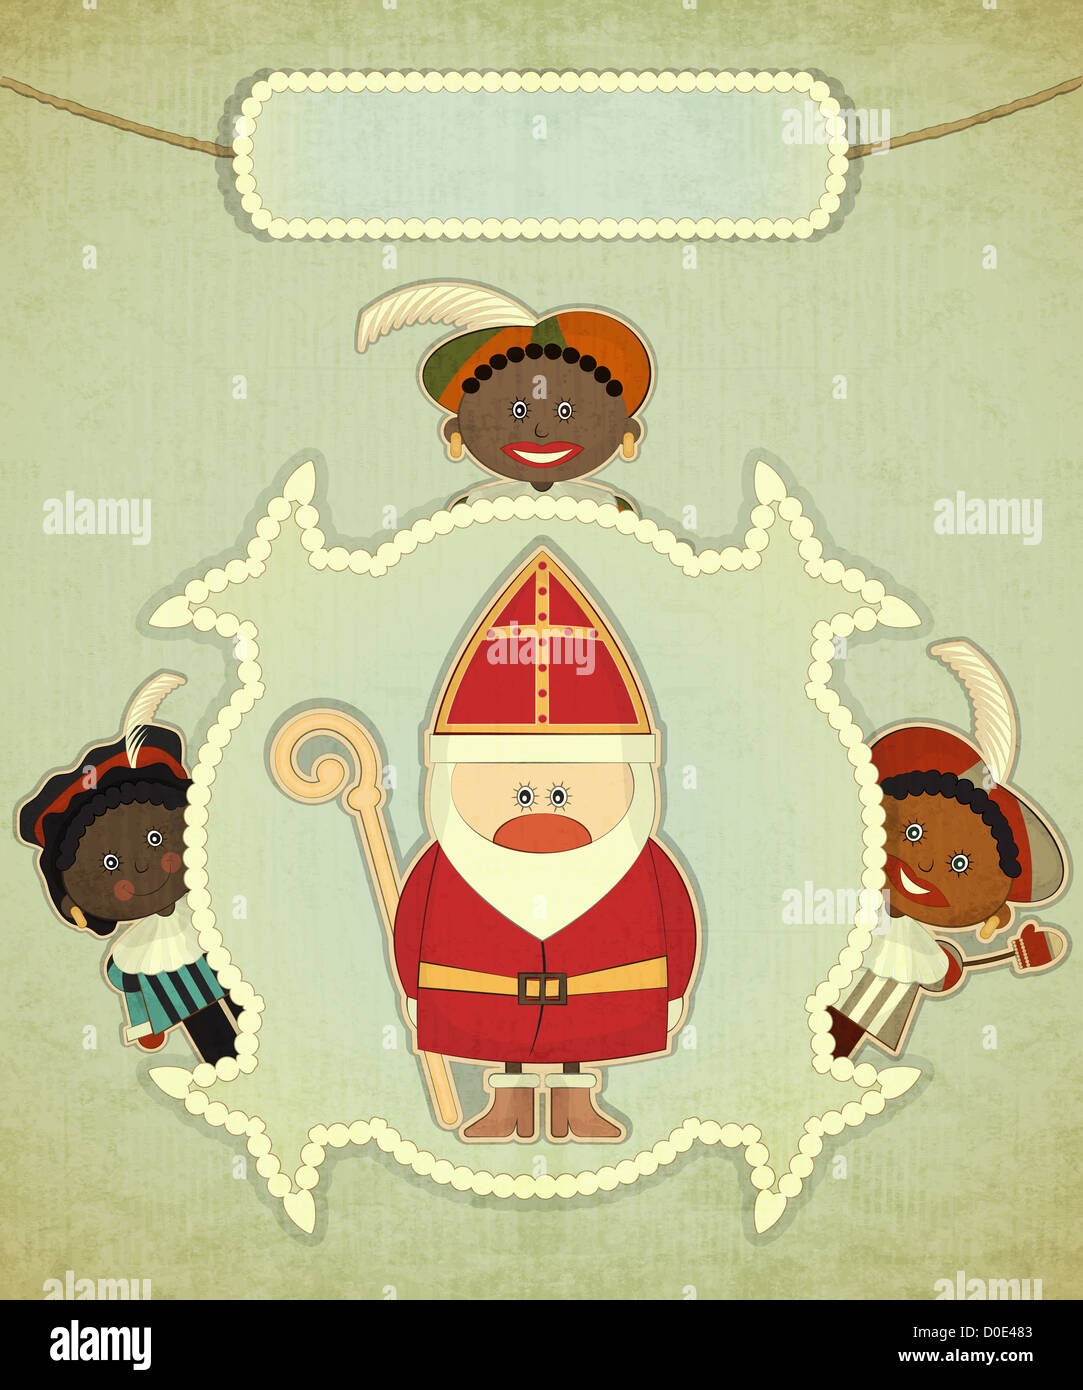 Christmas Card With Dutch Santa Claus Sinterklaas And Piet Stock